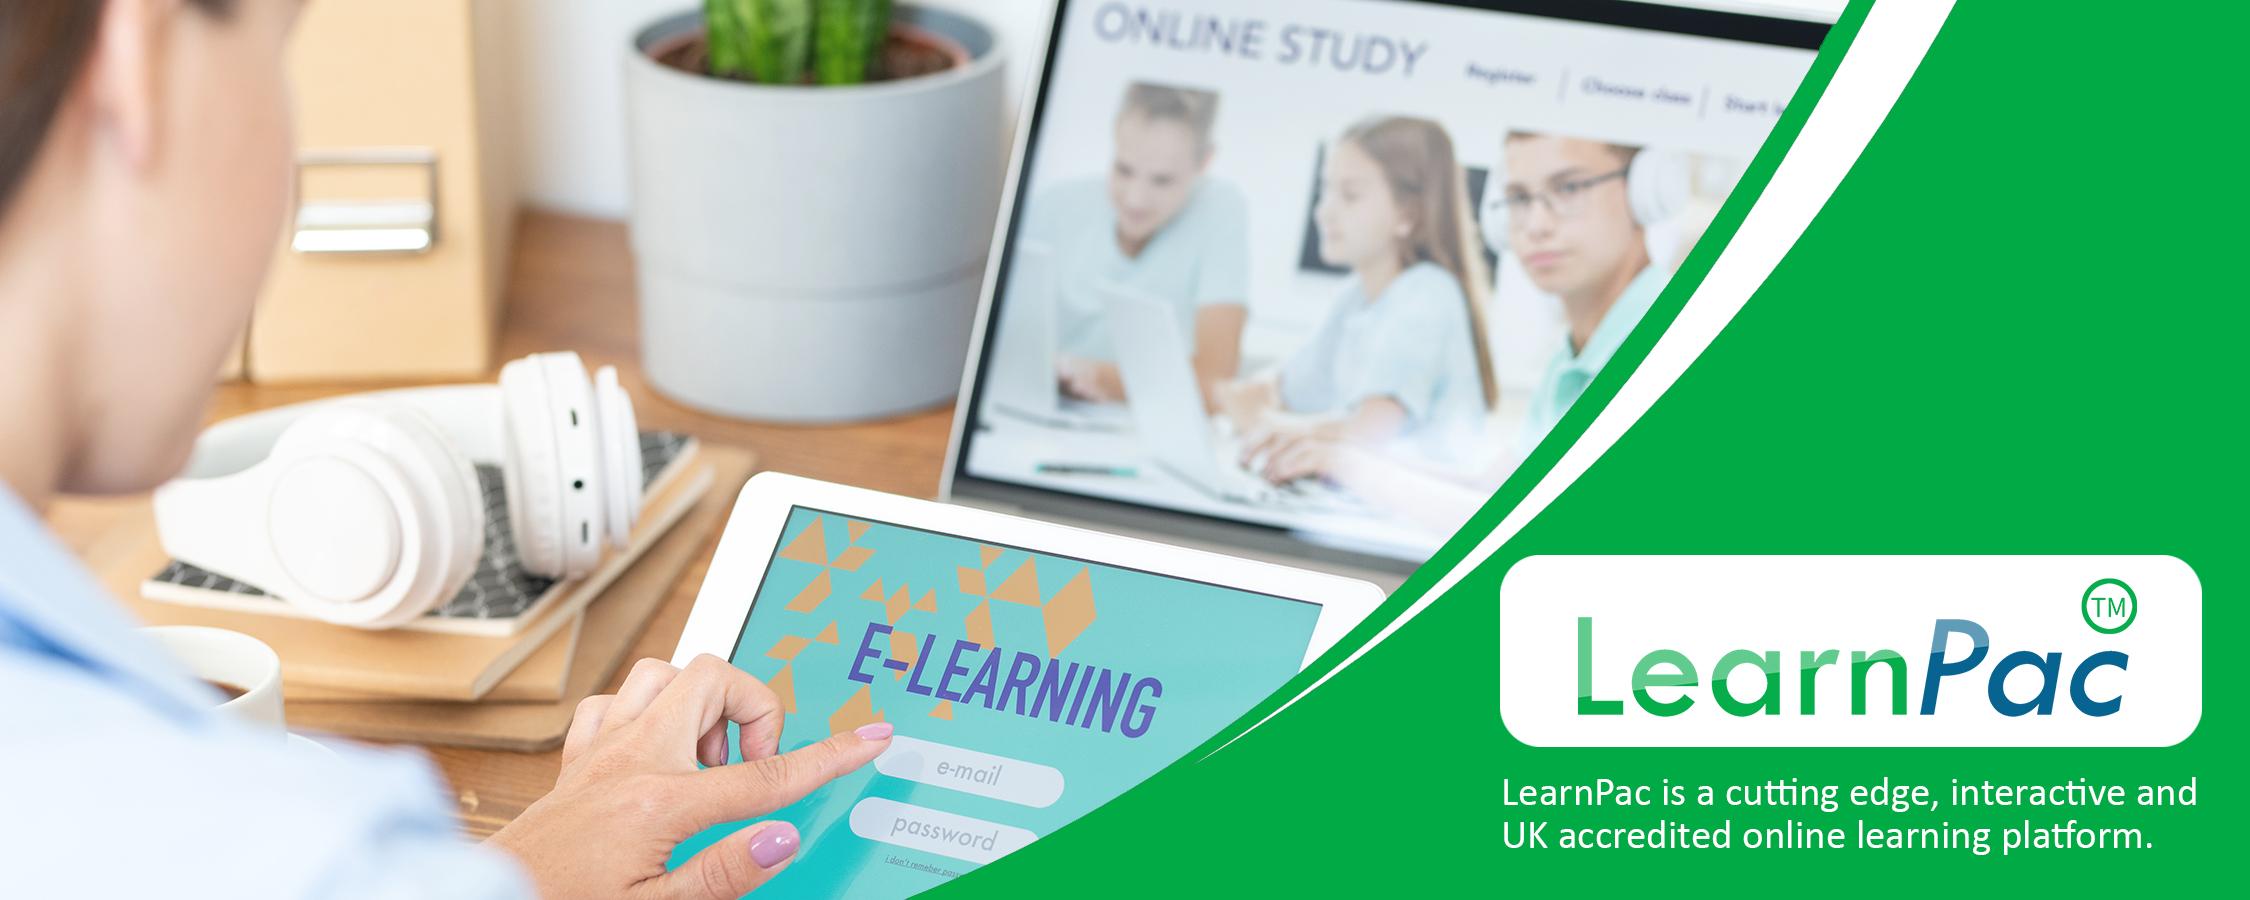 Safeguarding Adults at Risk – Level 1 - Online Learning Courses - E-Learning Courses - LearnPac Systems UK -